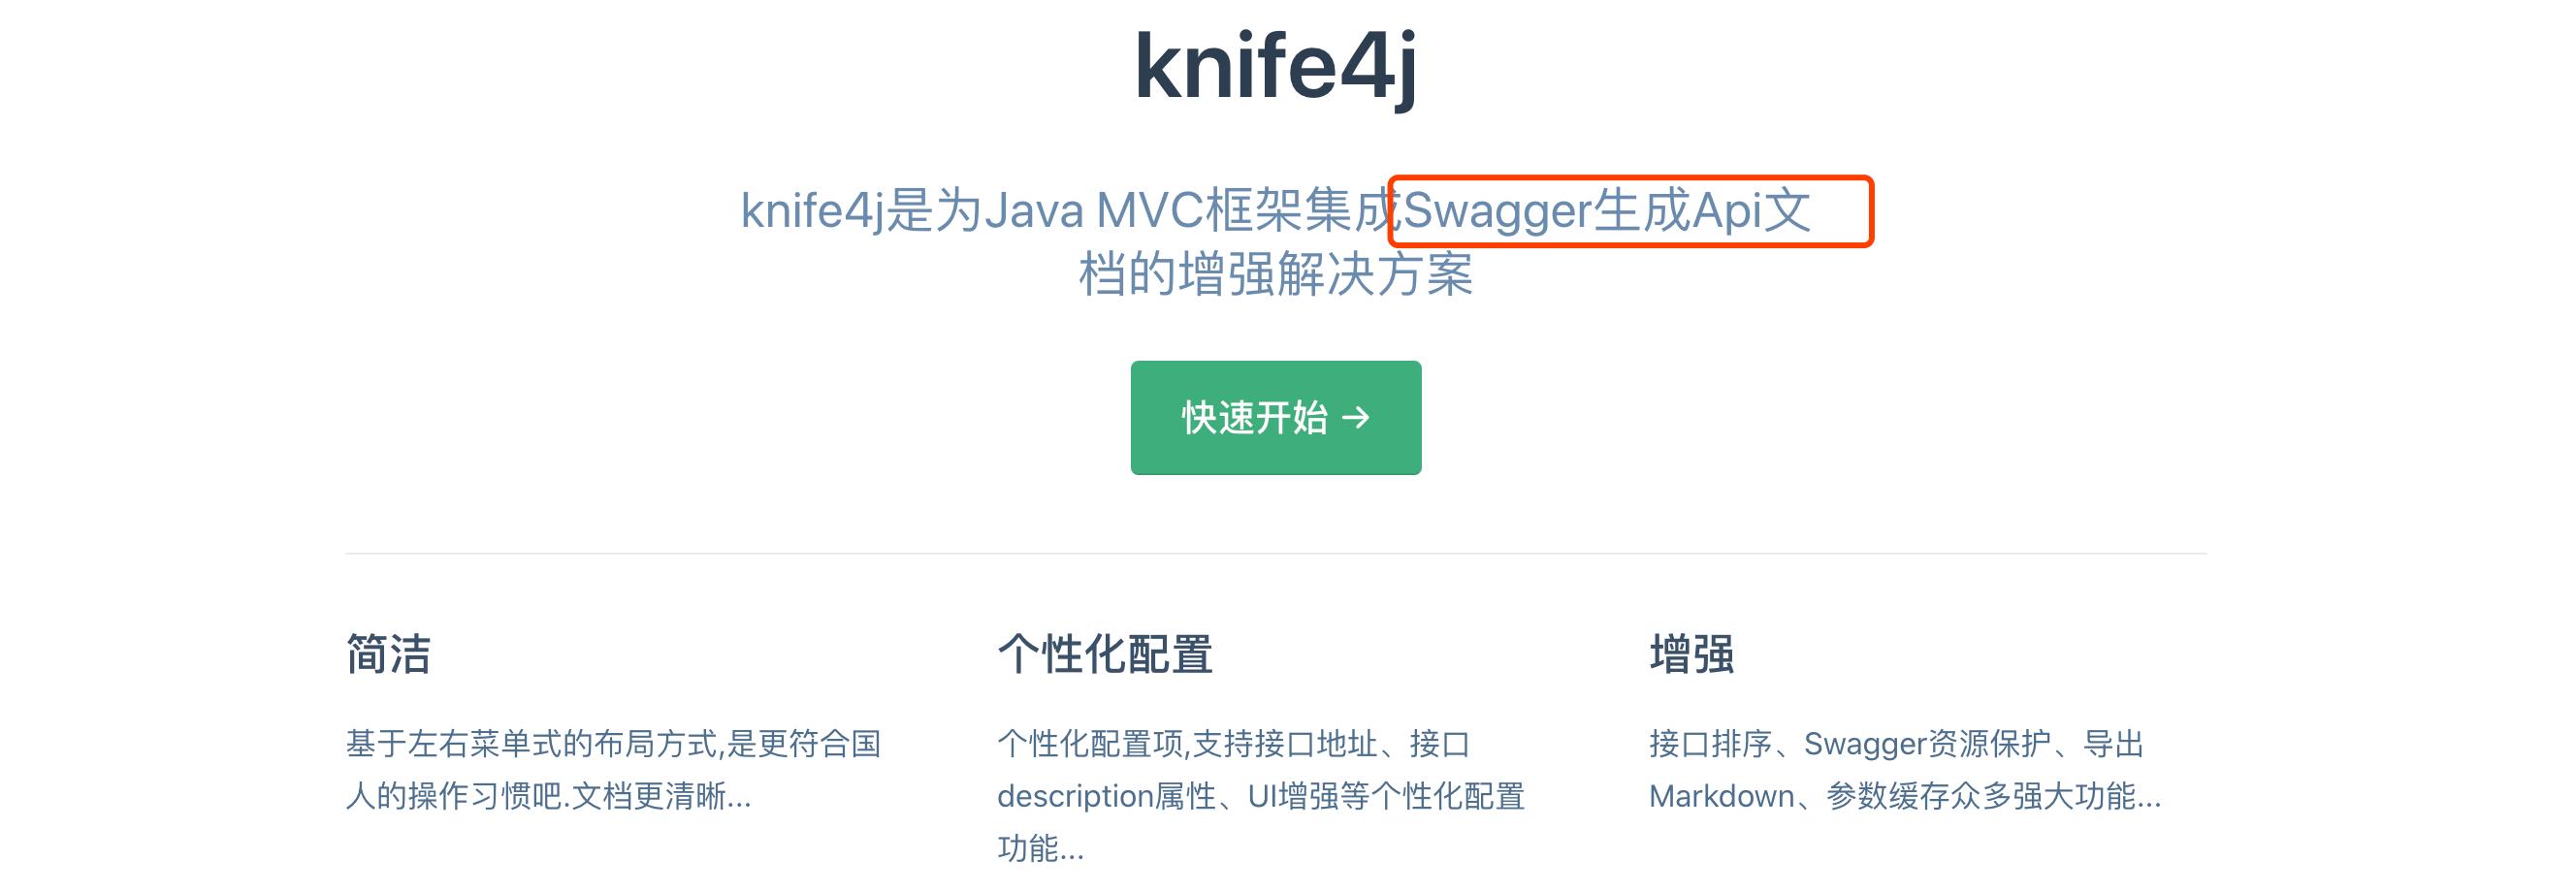 SpringBoot 优雅整合Swagger Api 自动生成文档